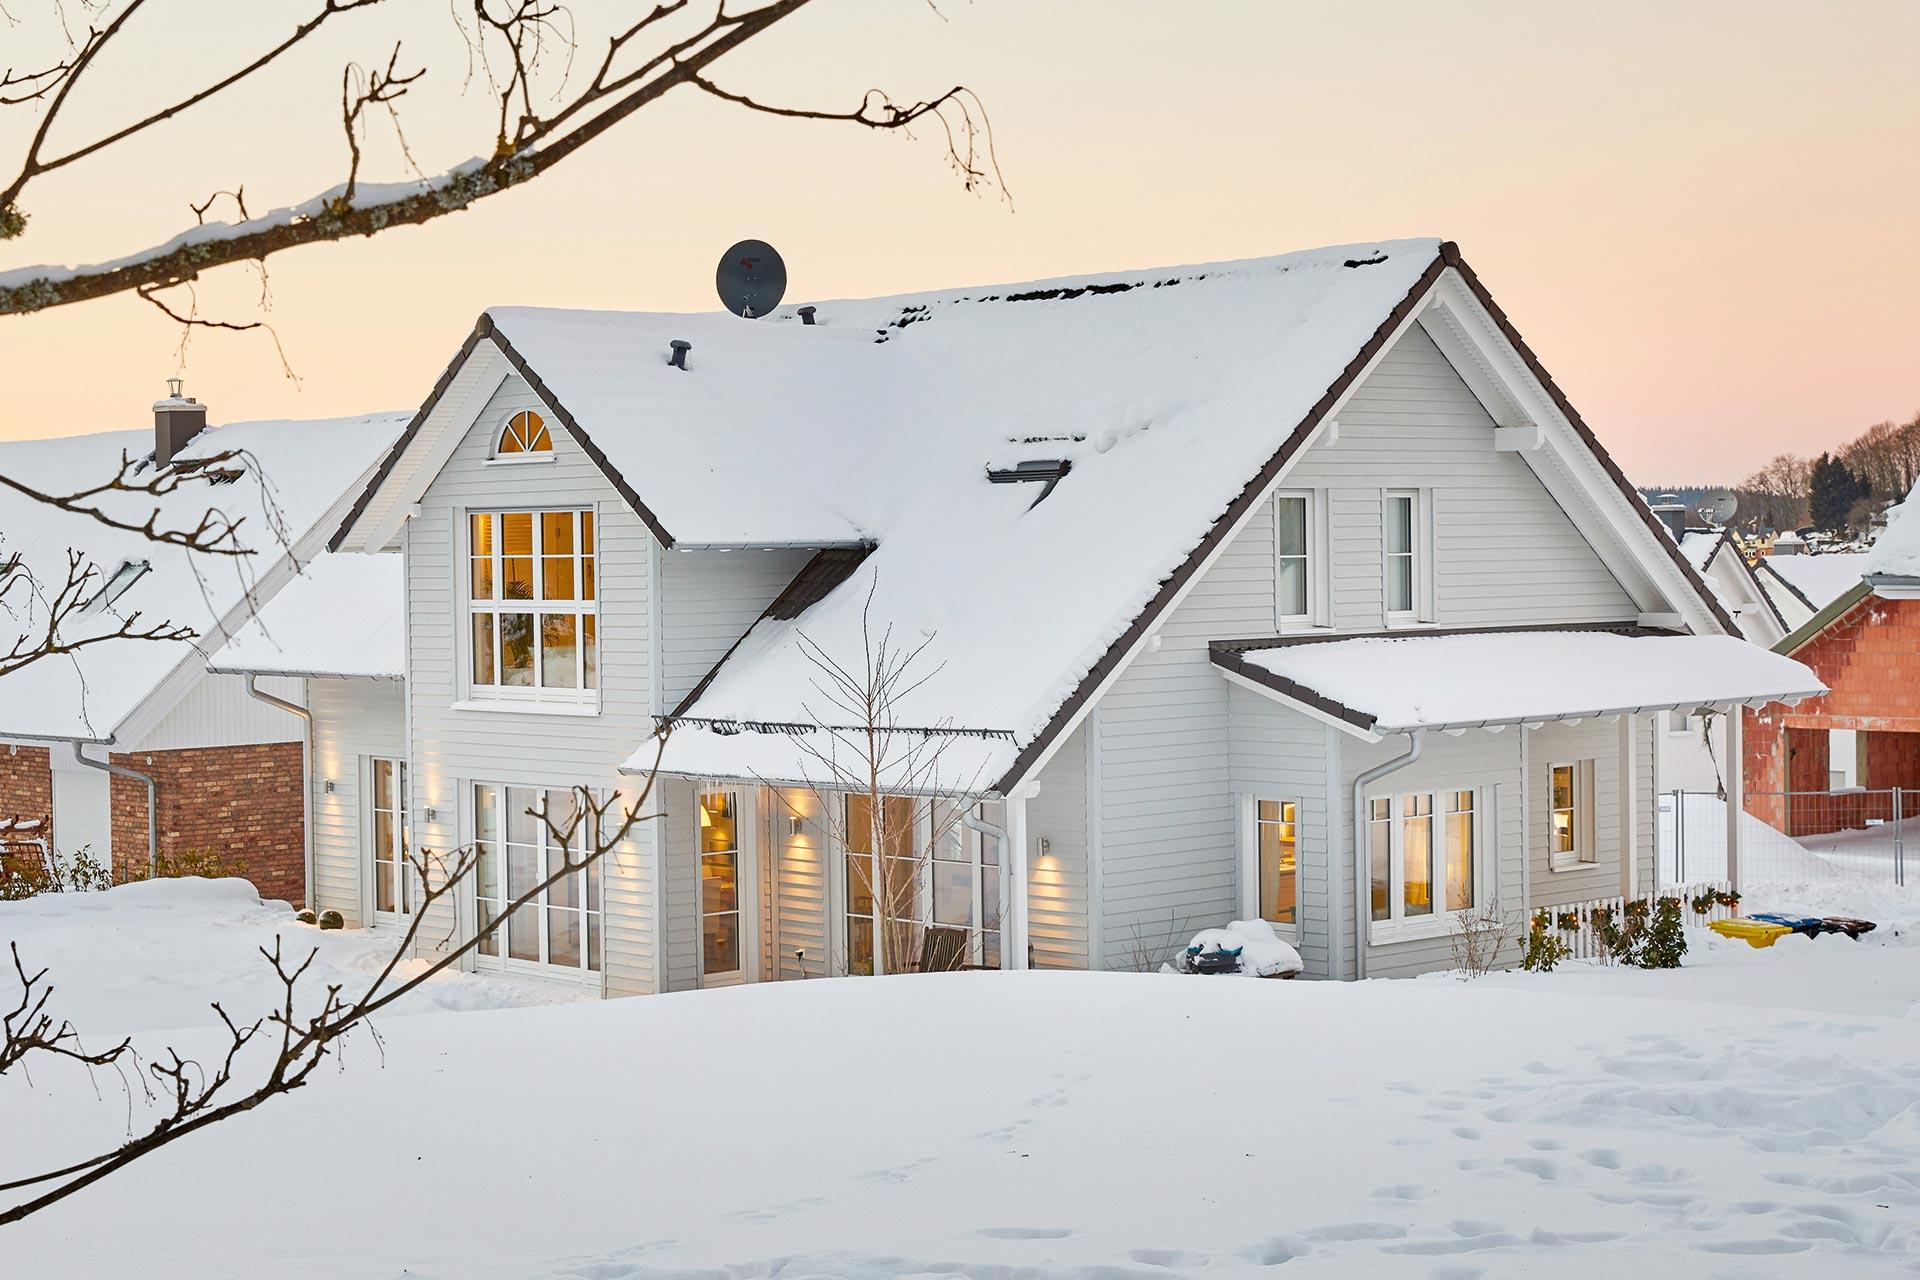 fertighaus modell siebenbrunn kfw effizienzhaus mit traumhaftem raumkonzept gussek haus. Black Bedroom Furniture Sets. Home Design Ideas